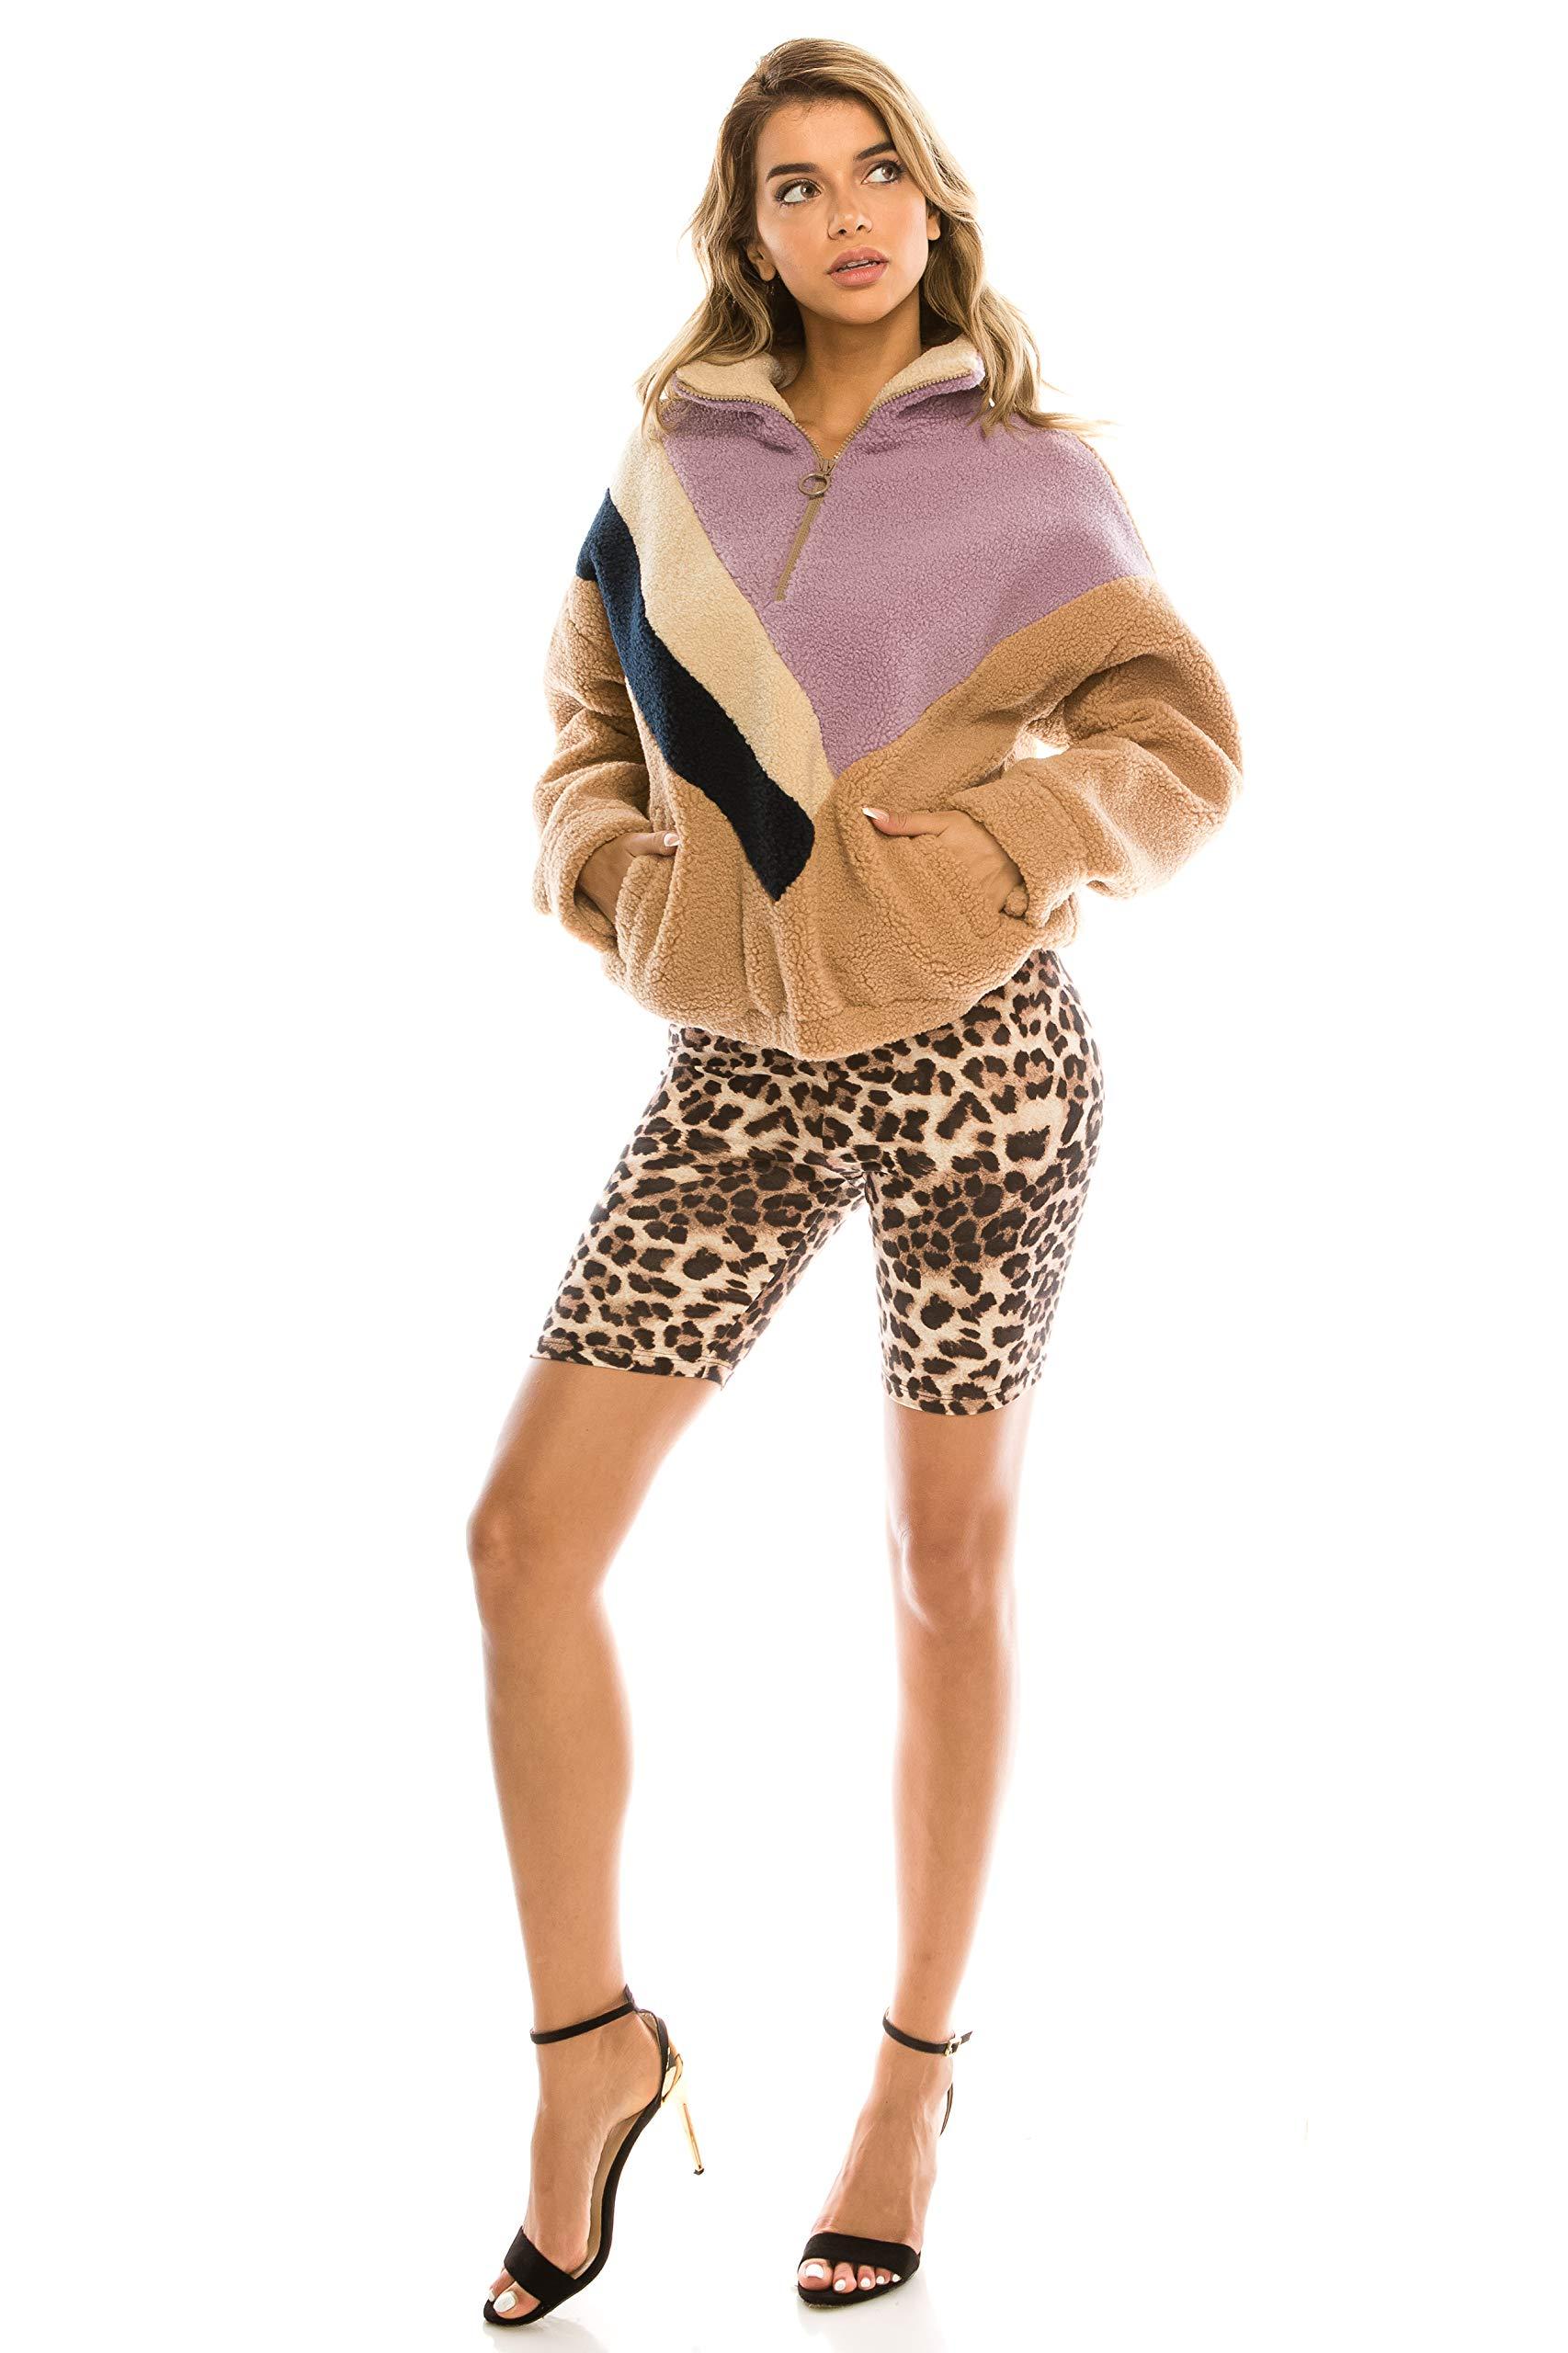 CNC STYLE B003 Women's Knee Length Stretch High Waist Leopard Print Active Bike Yoga Short Leggings, Leopard, Medium by CNC STYLE